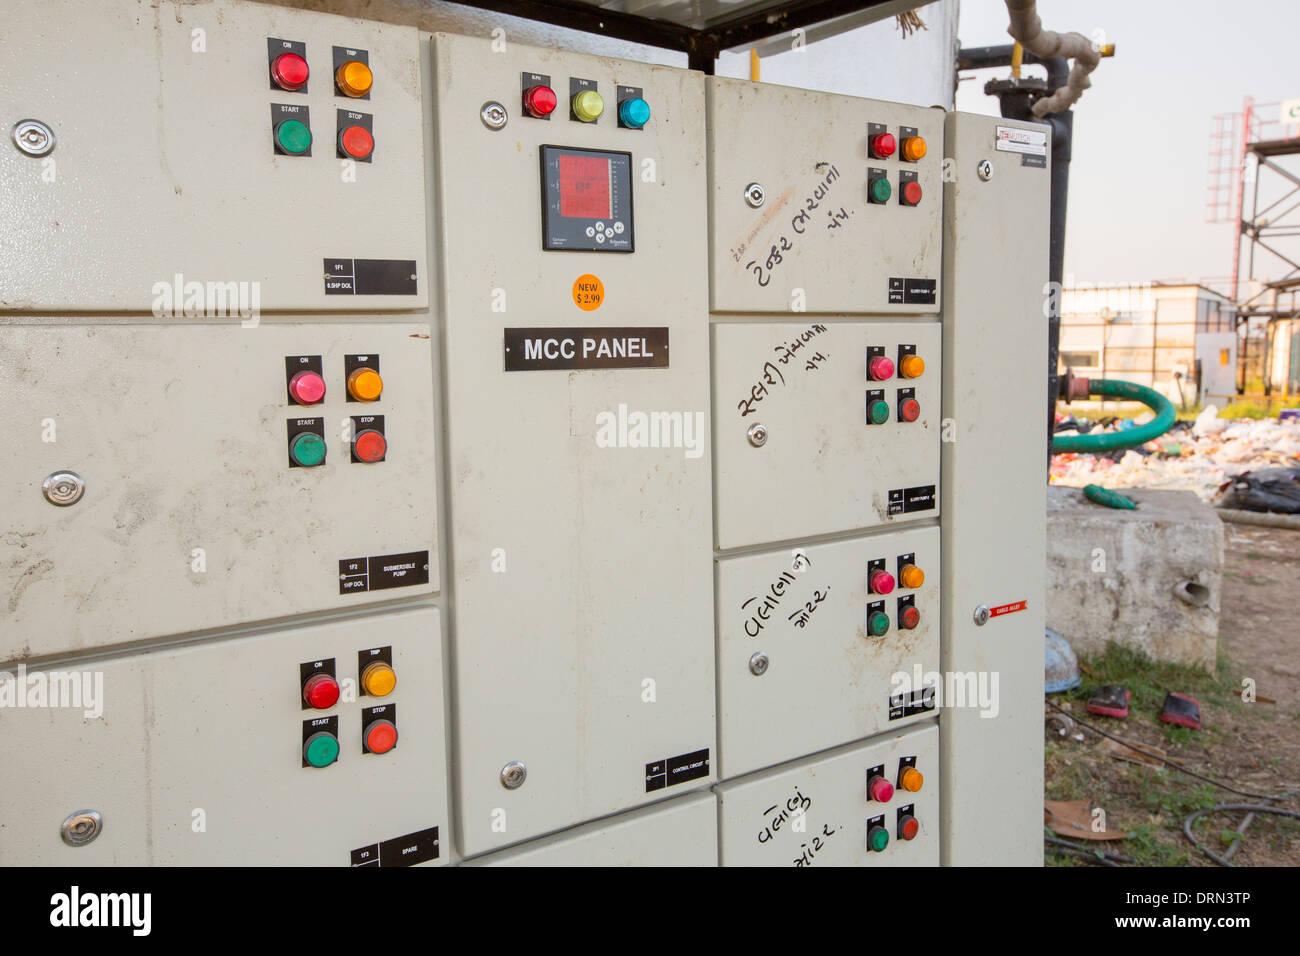 Biogas Plant India Stock Photos & Biogas Plant India Stock